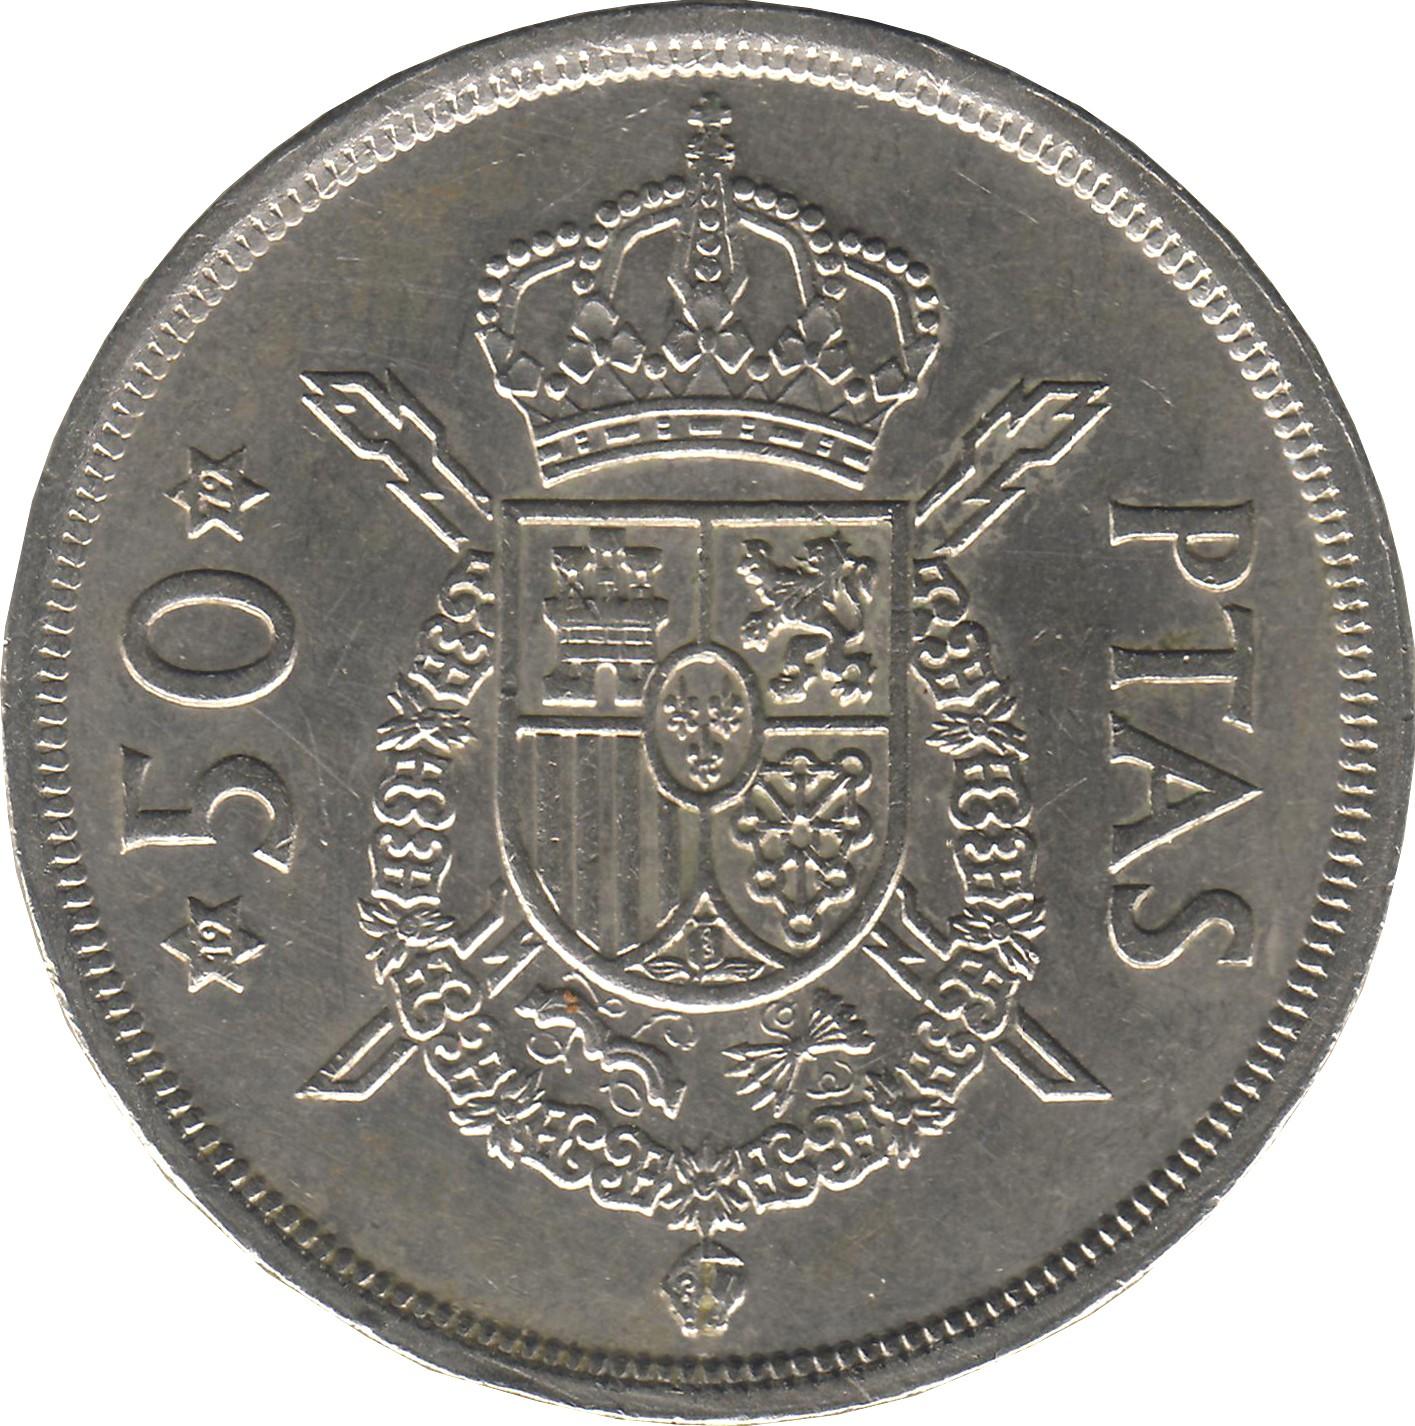 Spain 50 Pesetas (1975)